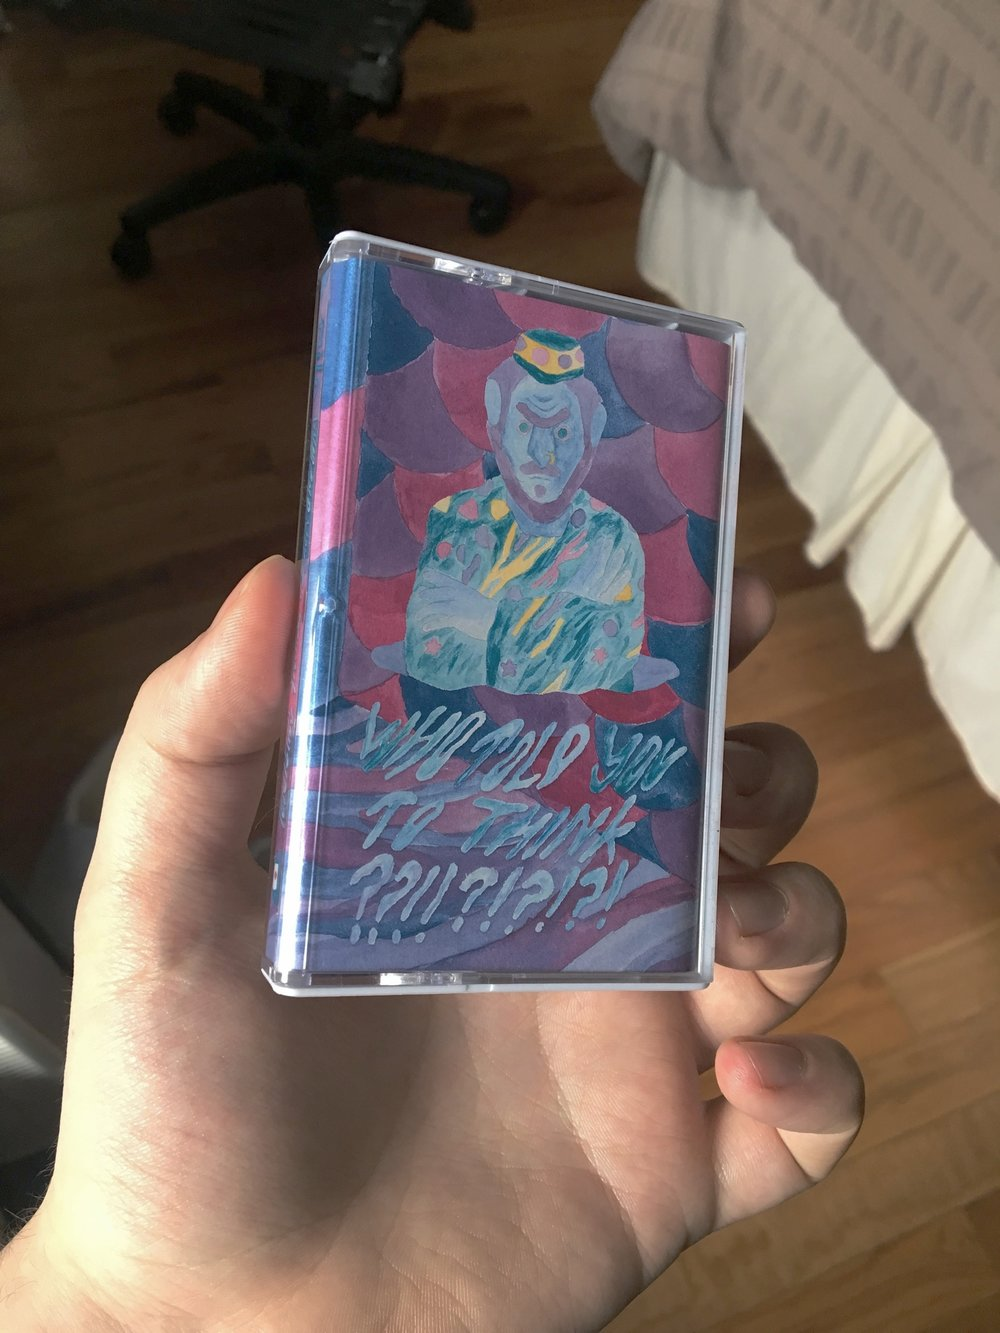 me holding the casette